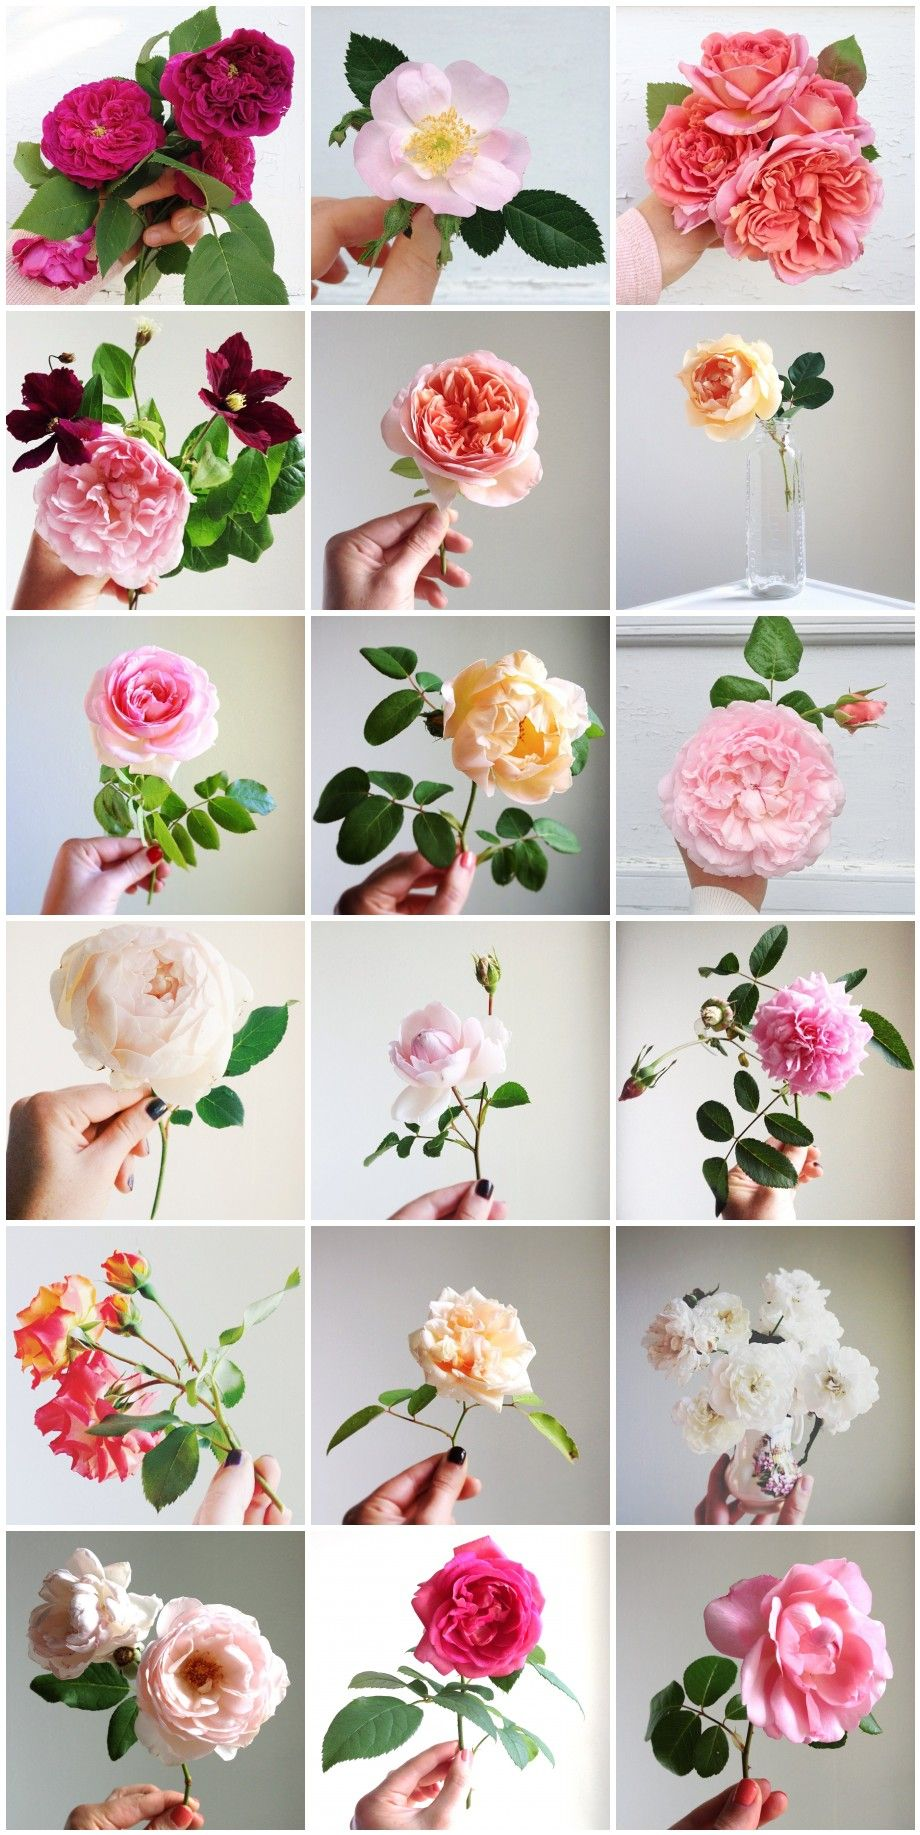 Simple Rose Garden: Simple Beauty Rose Series Via HedgerowRose.com